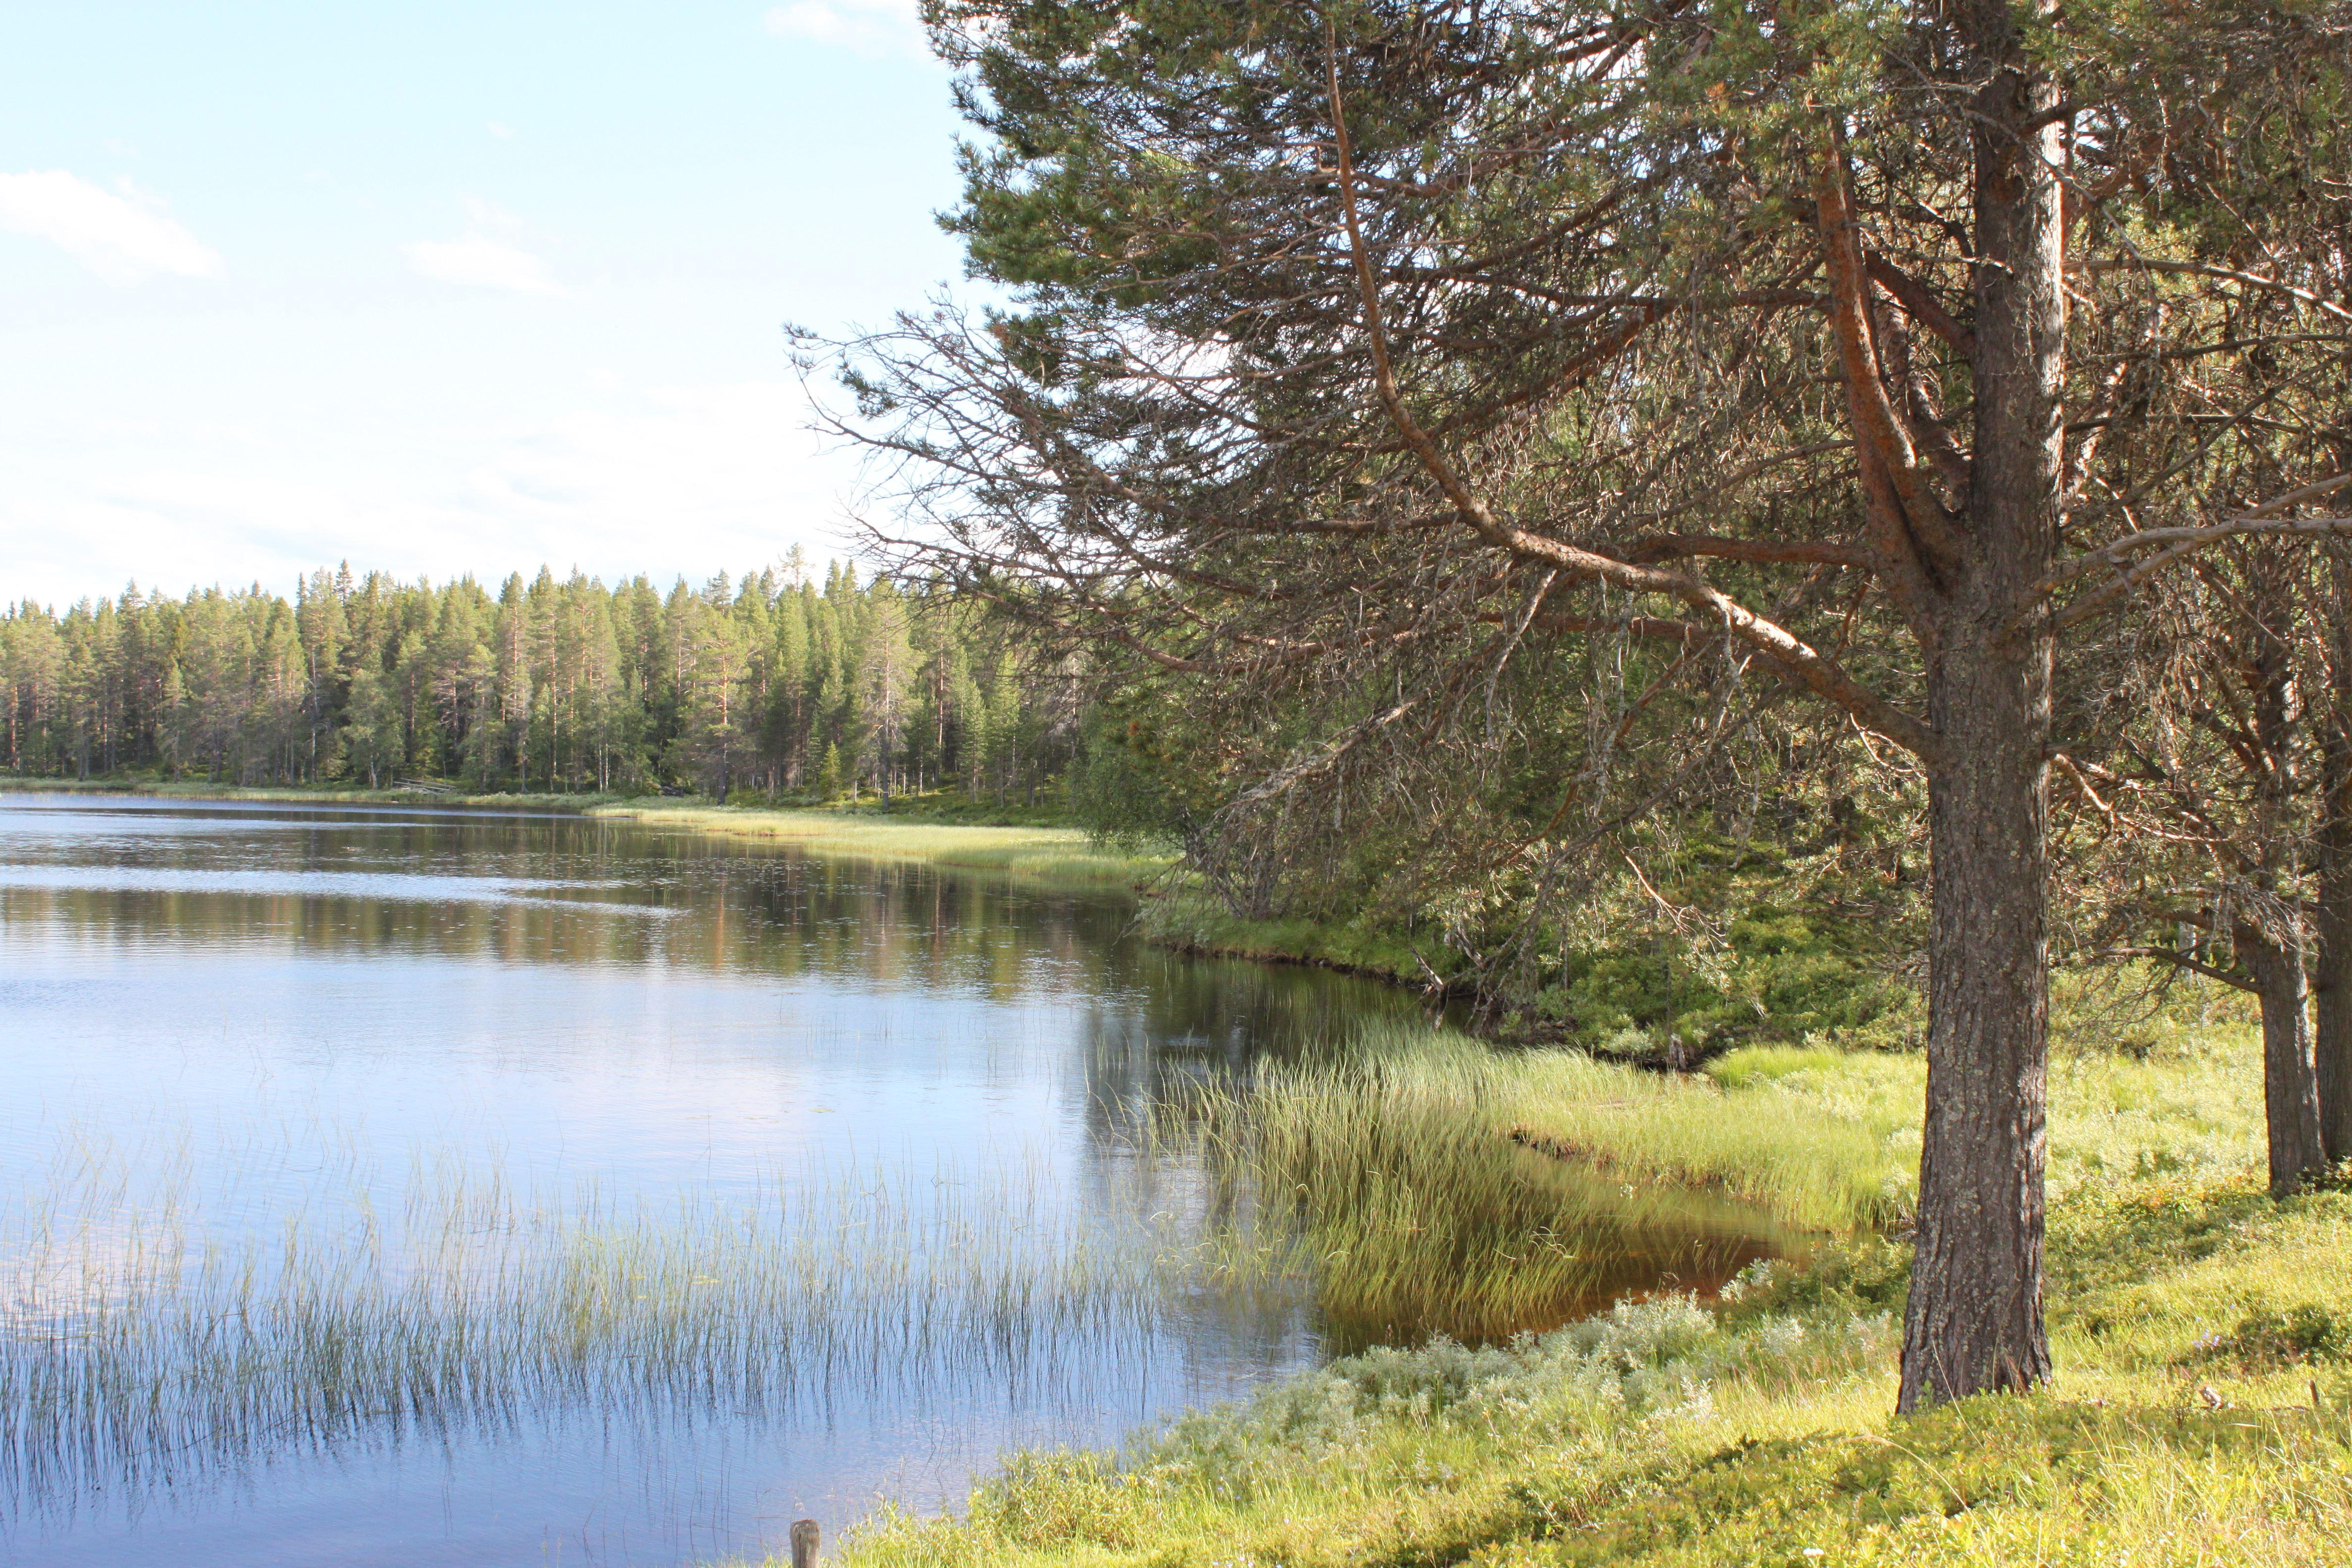 © Malå kommun, Kanotled Malån